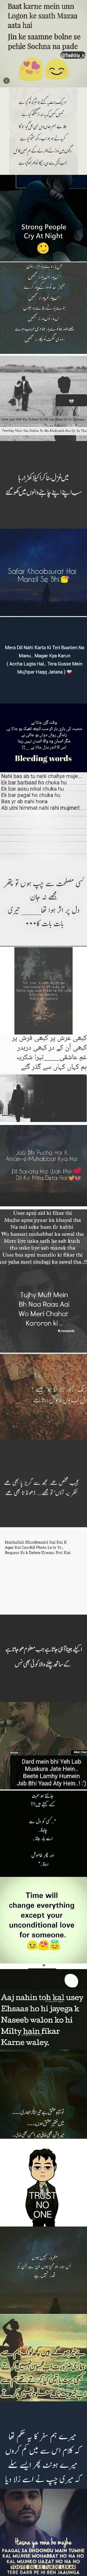 Mere dil ka Haal Dekh Le Paglet ladke   Inspirational quotes ...